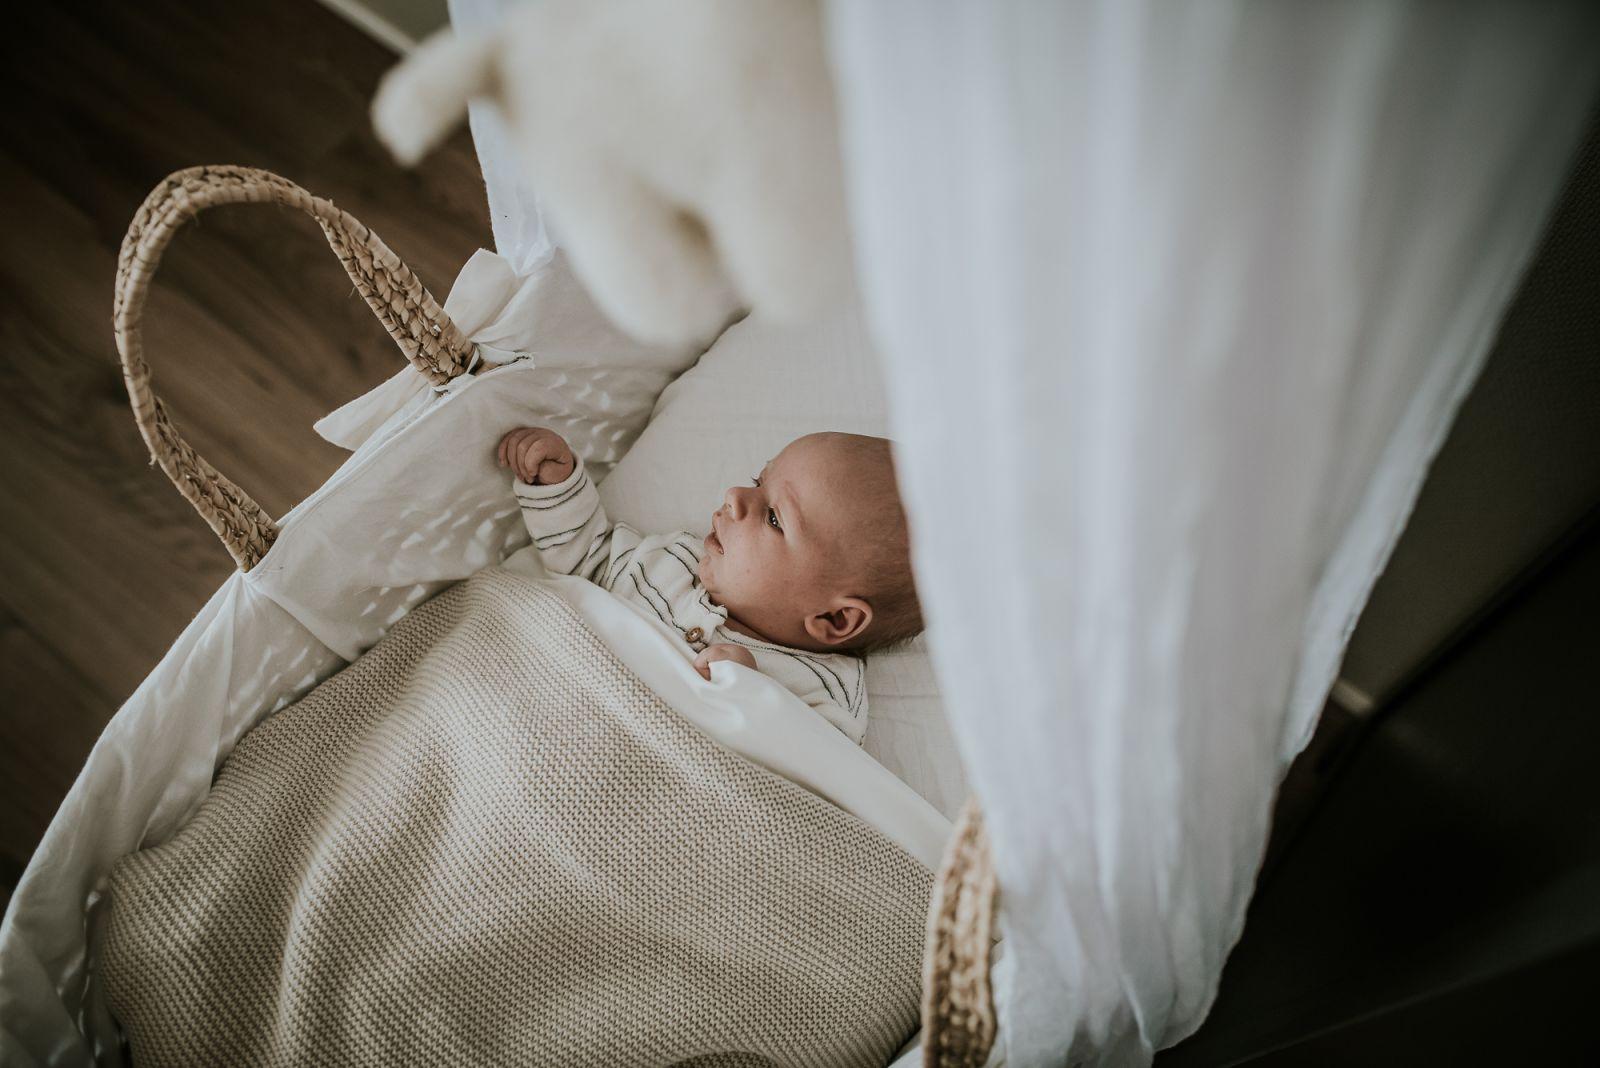 newbornshoot door newbornfotograaf Nickie Fotografie uit Dokkum, Friesland